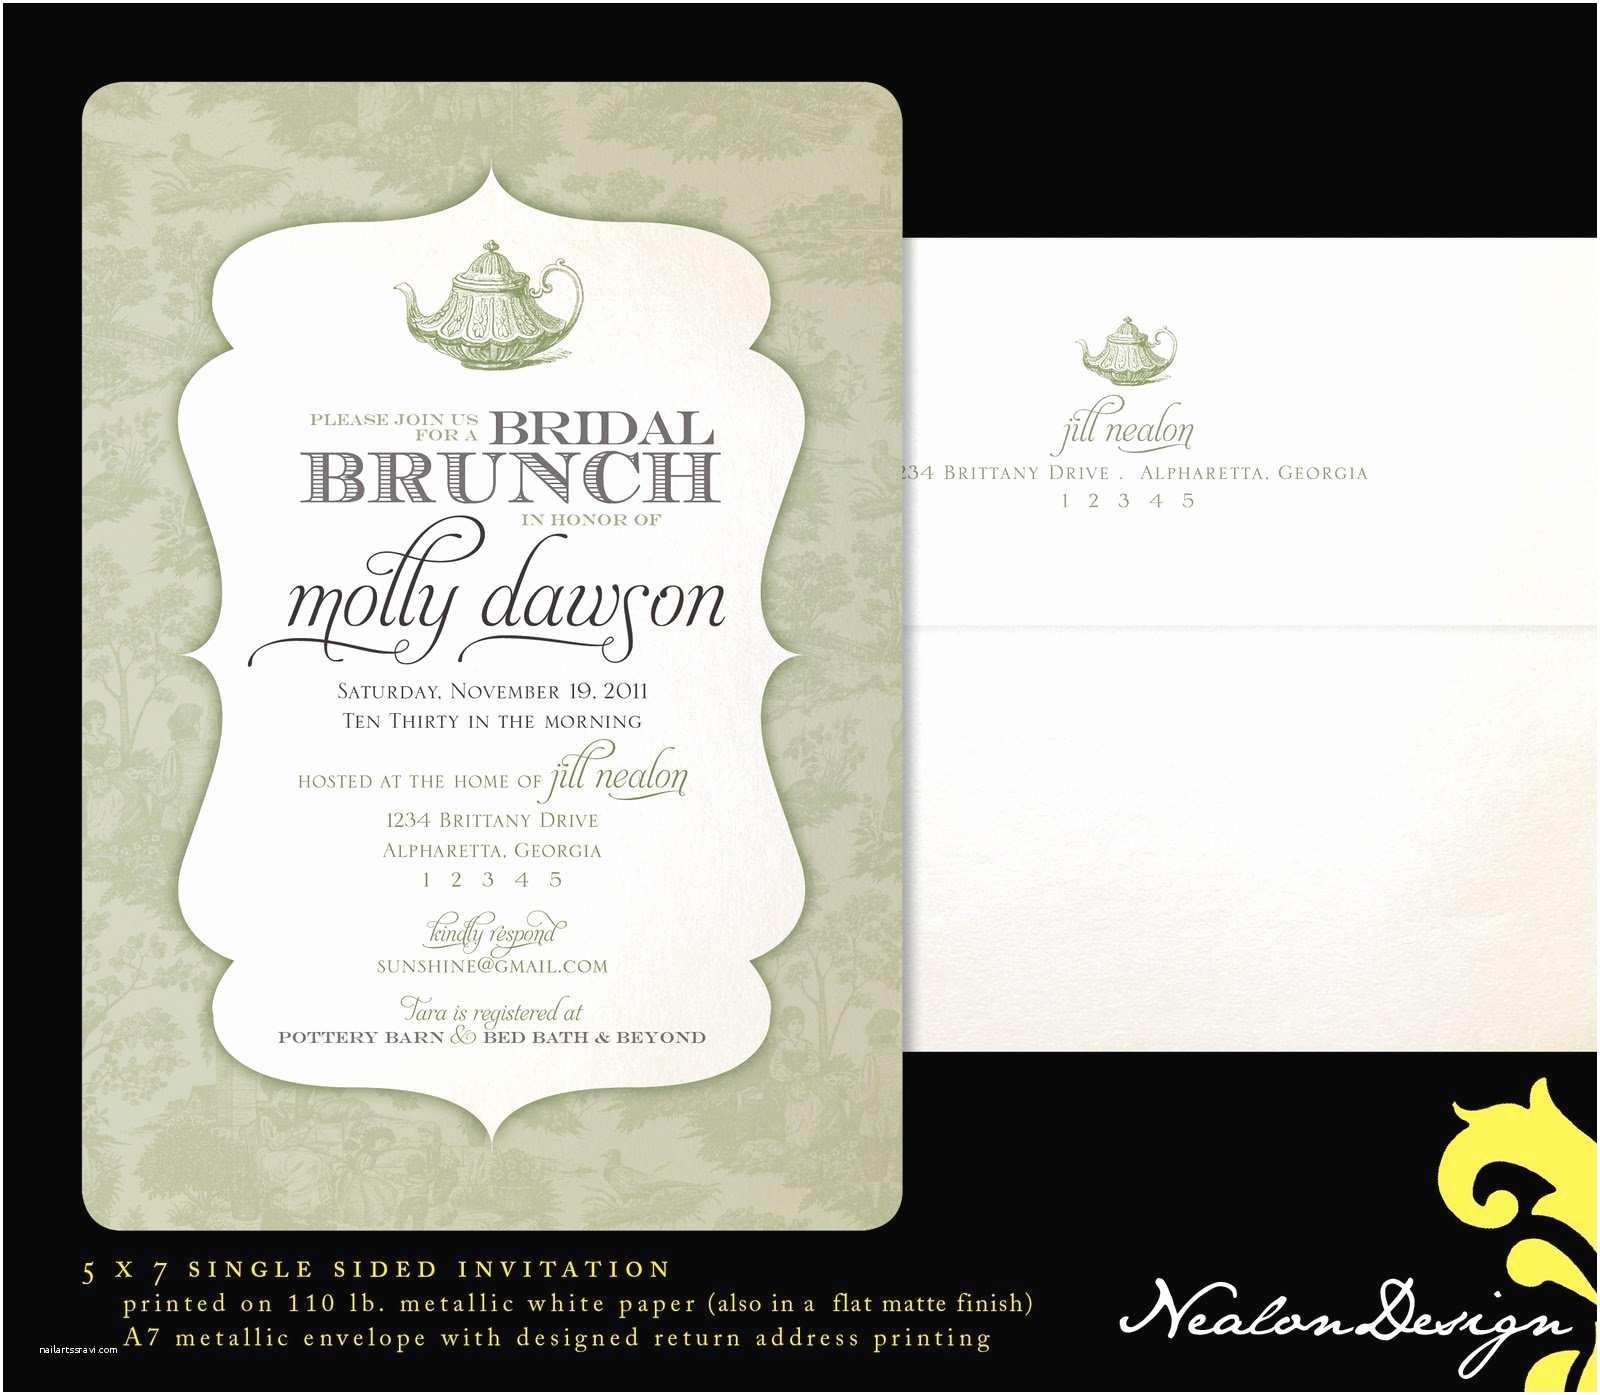 Bridal Shower Invitation Wording Invitation Wording Brunch Gallery Invitation Sample and